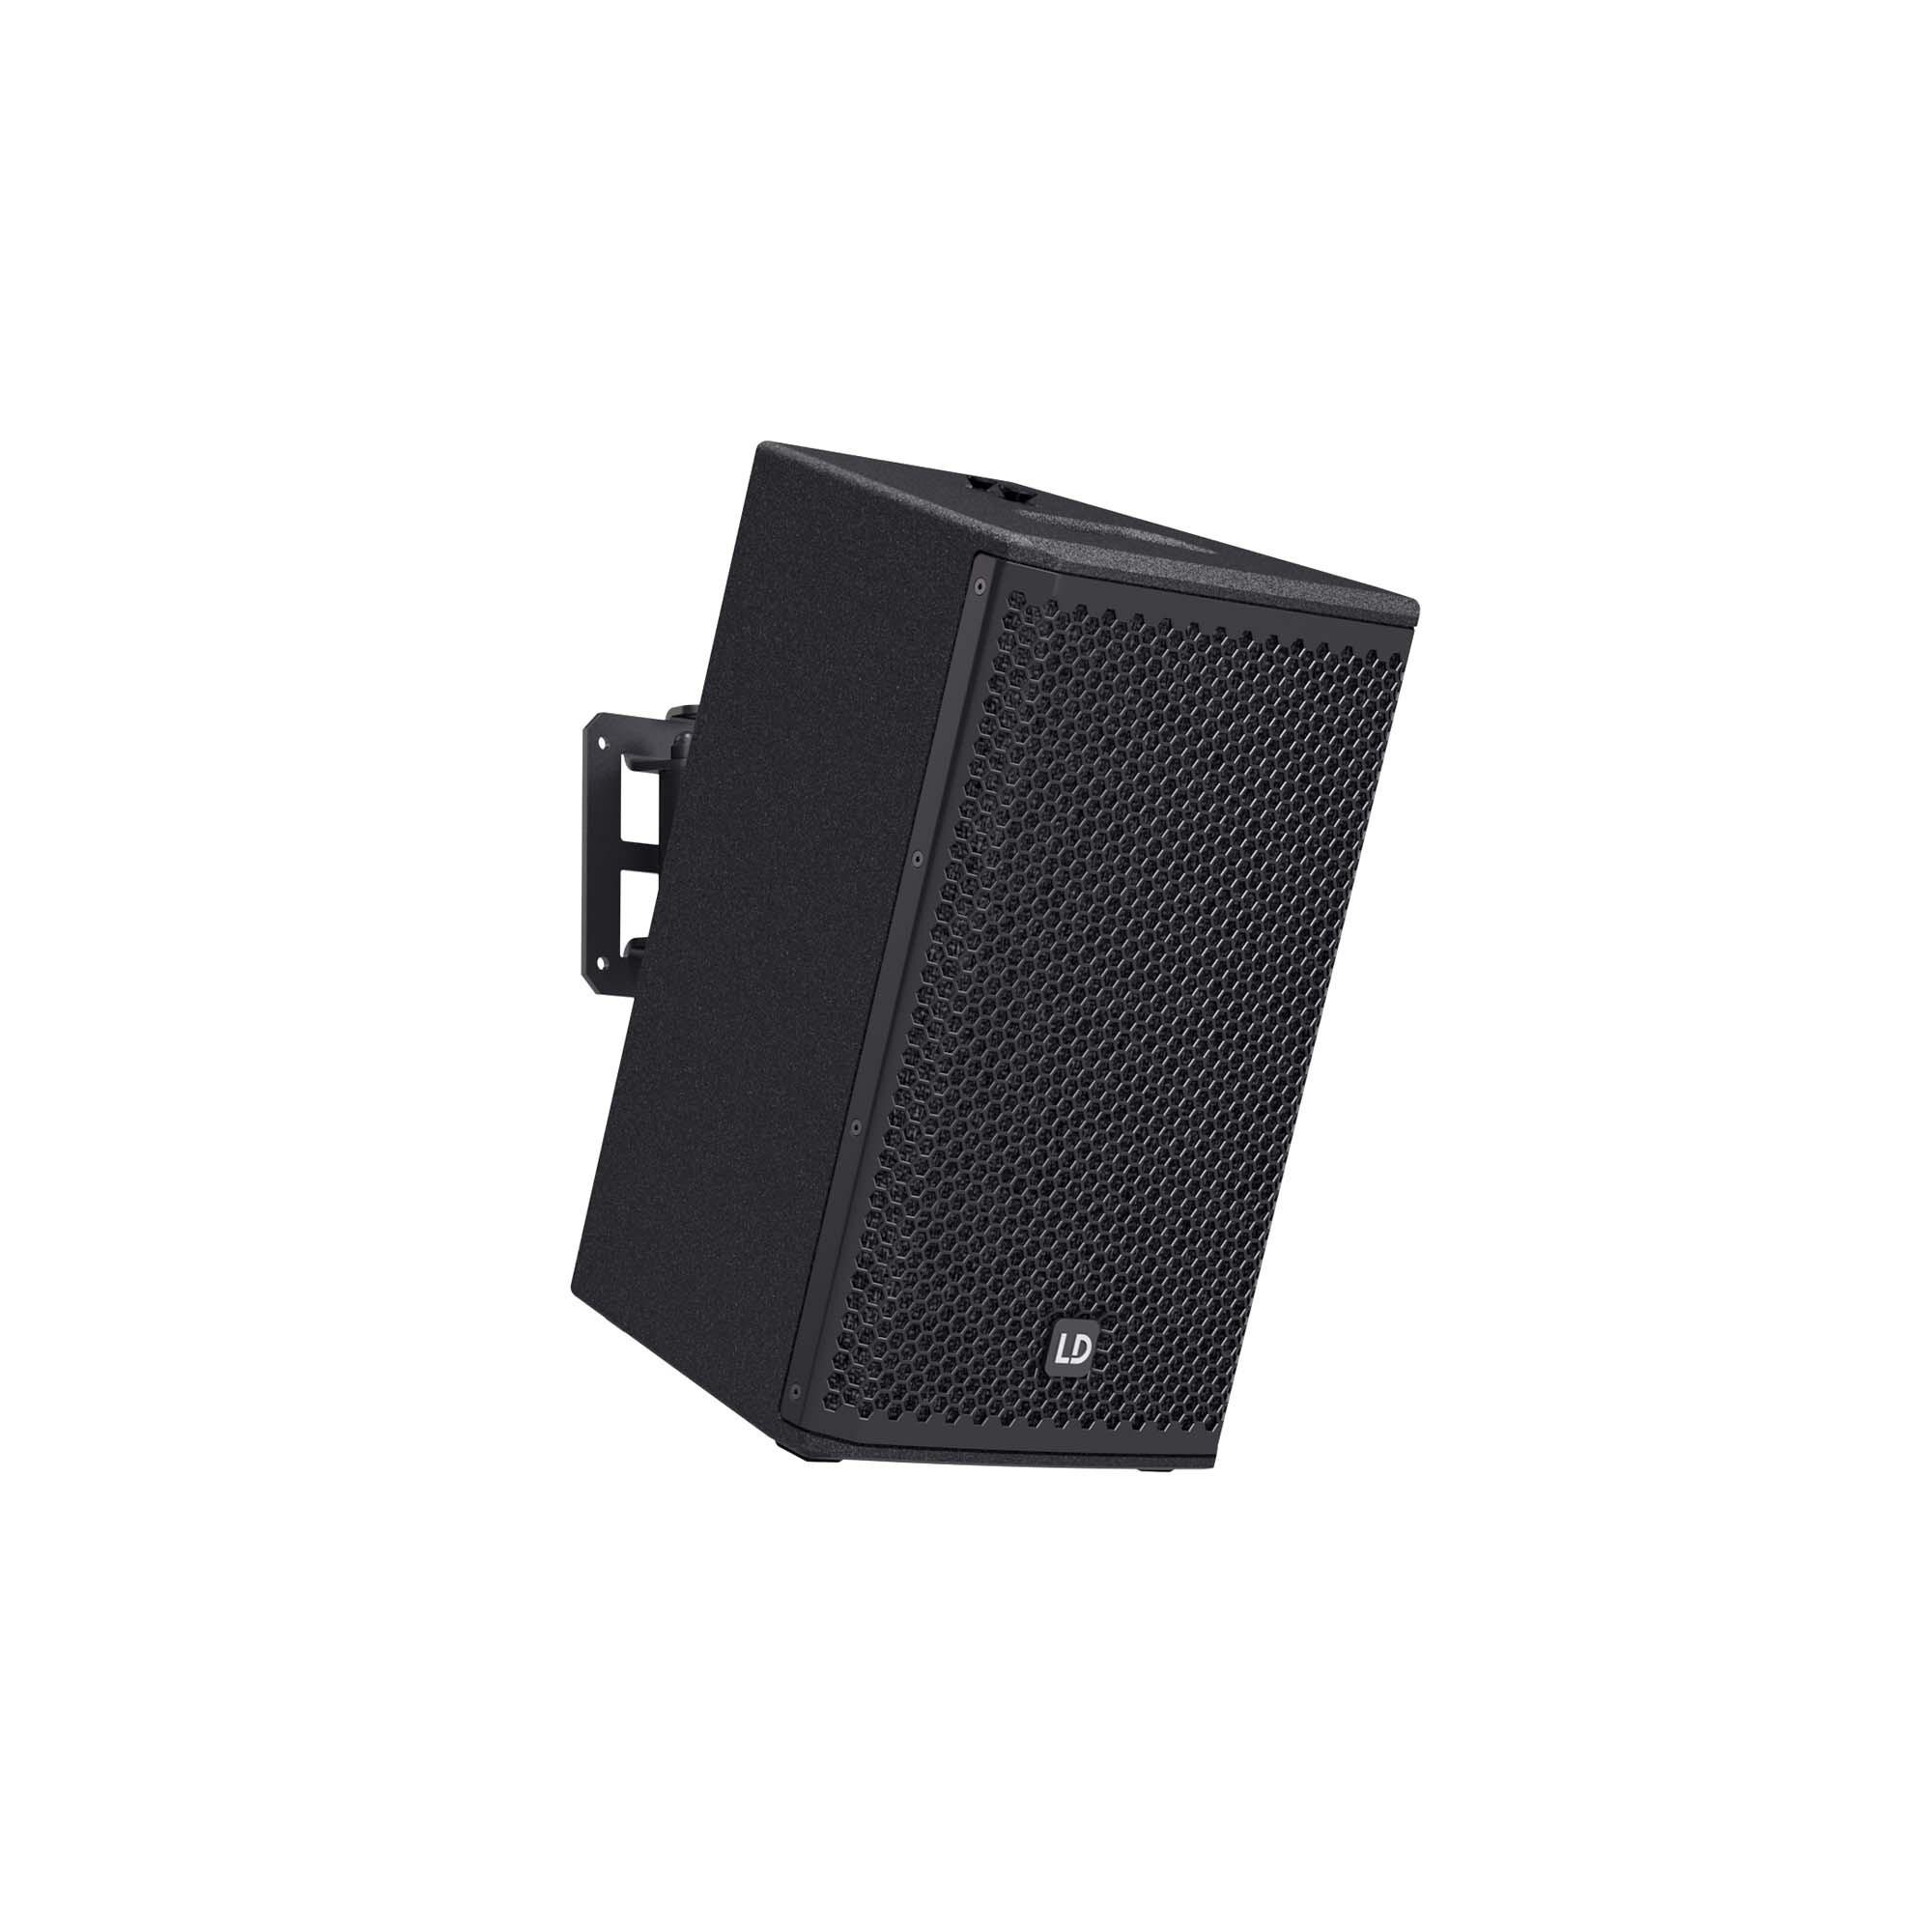 STINGER 8 G3 WMB 1 Soporte de pared inclinable y giratorio, adecuado para Stinger® 8 G3 (pasivo)